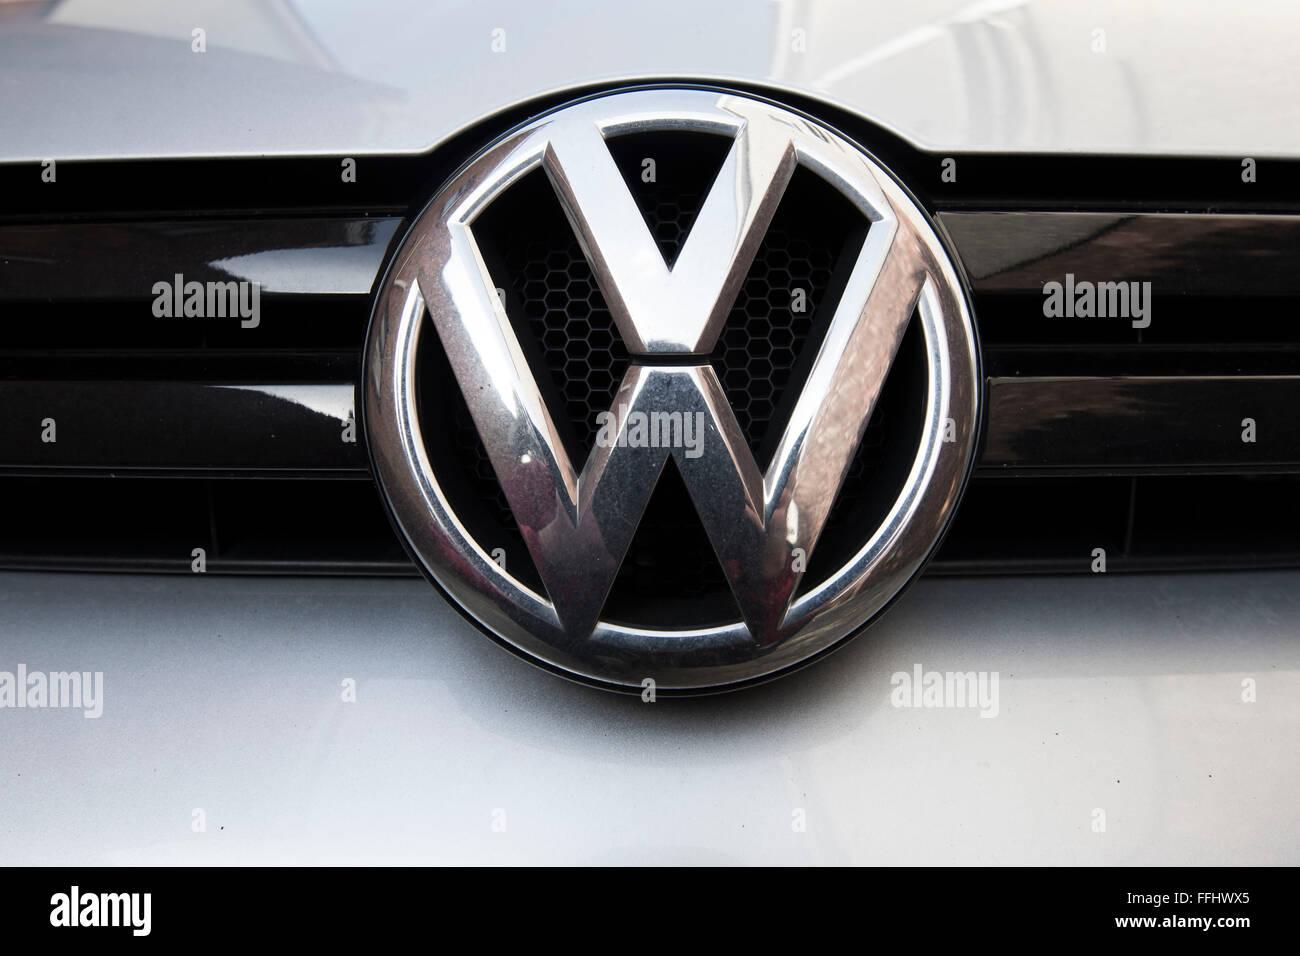 Volkswagen VW car logo brand. - Stock Image